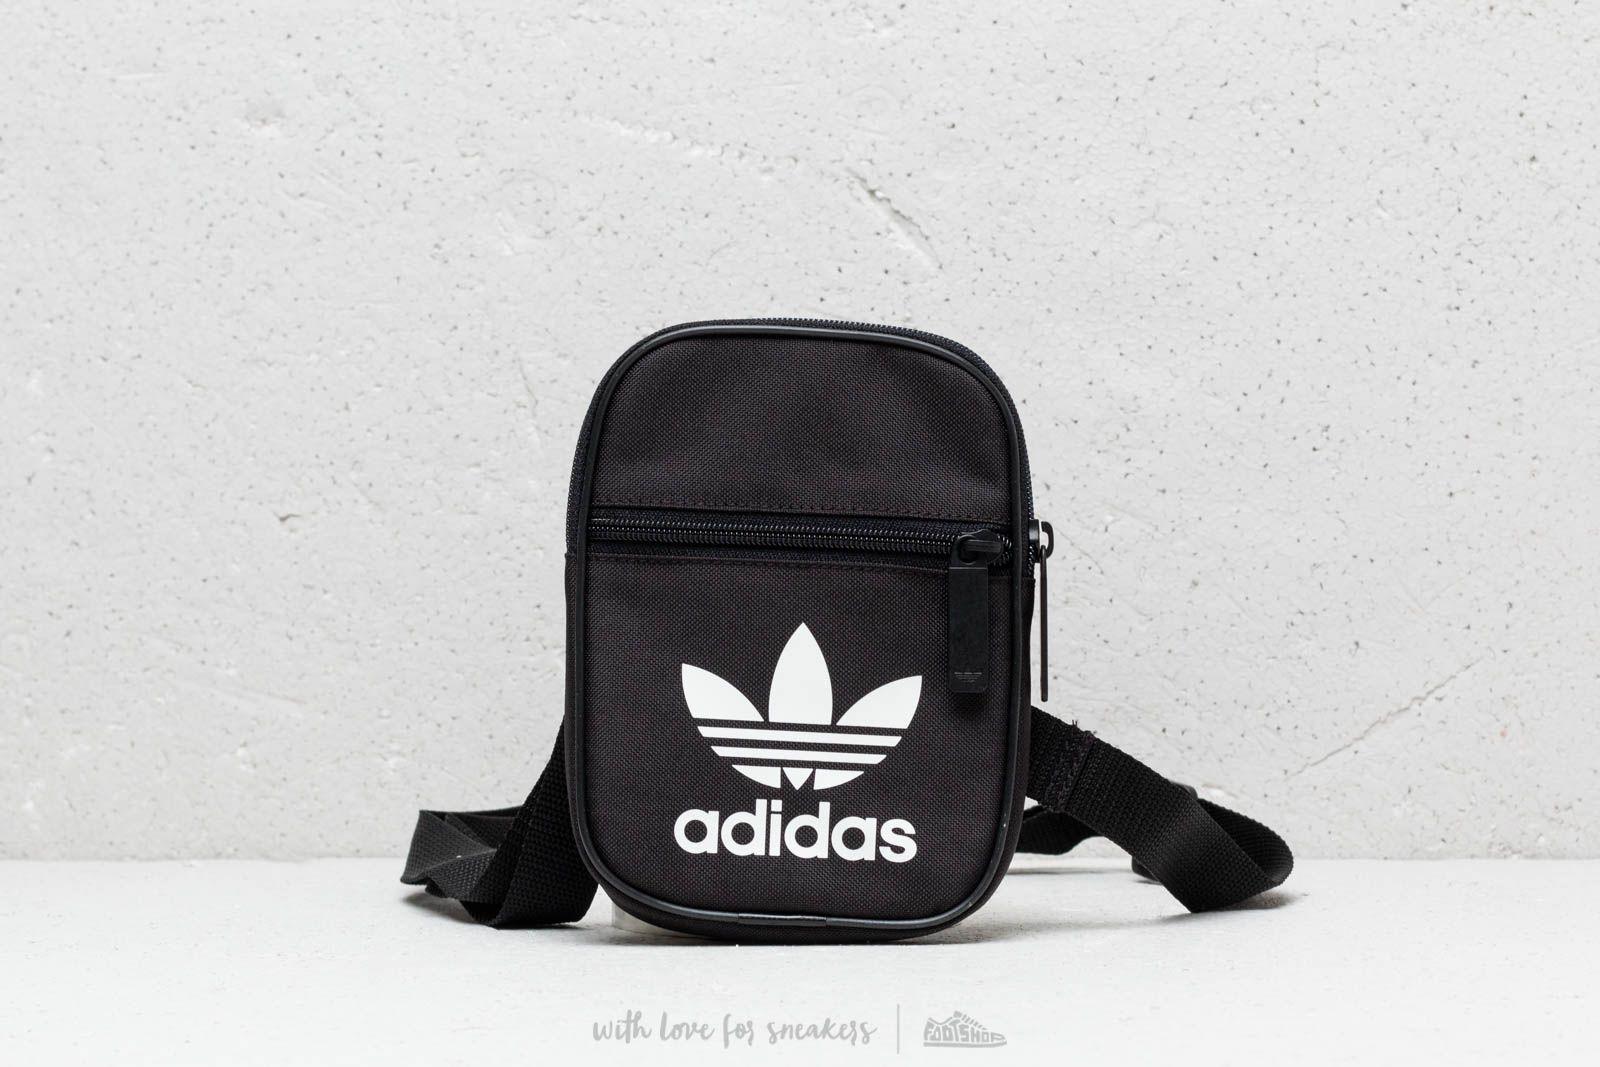 adidas Trefoil Festival Bag Black  White  6c6bd9a6d97bc